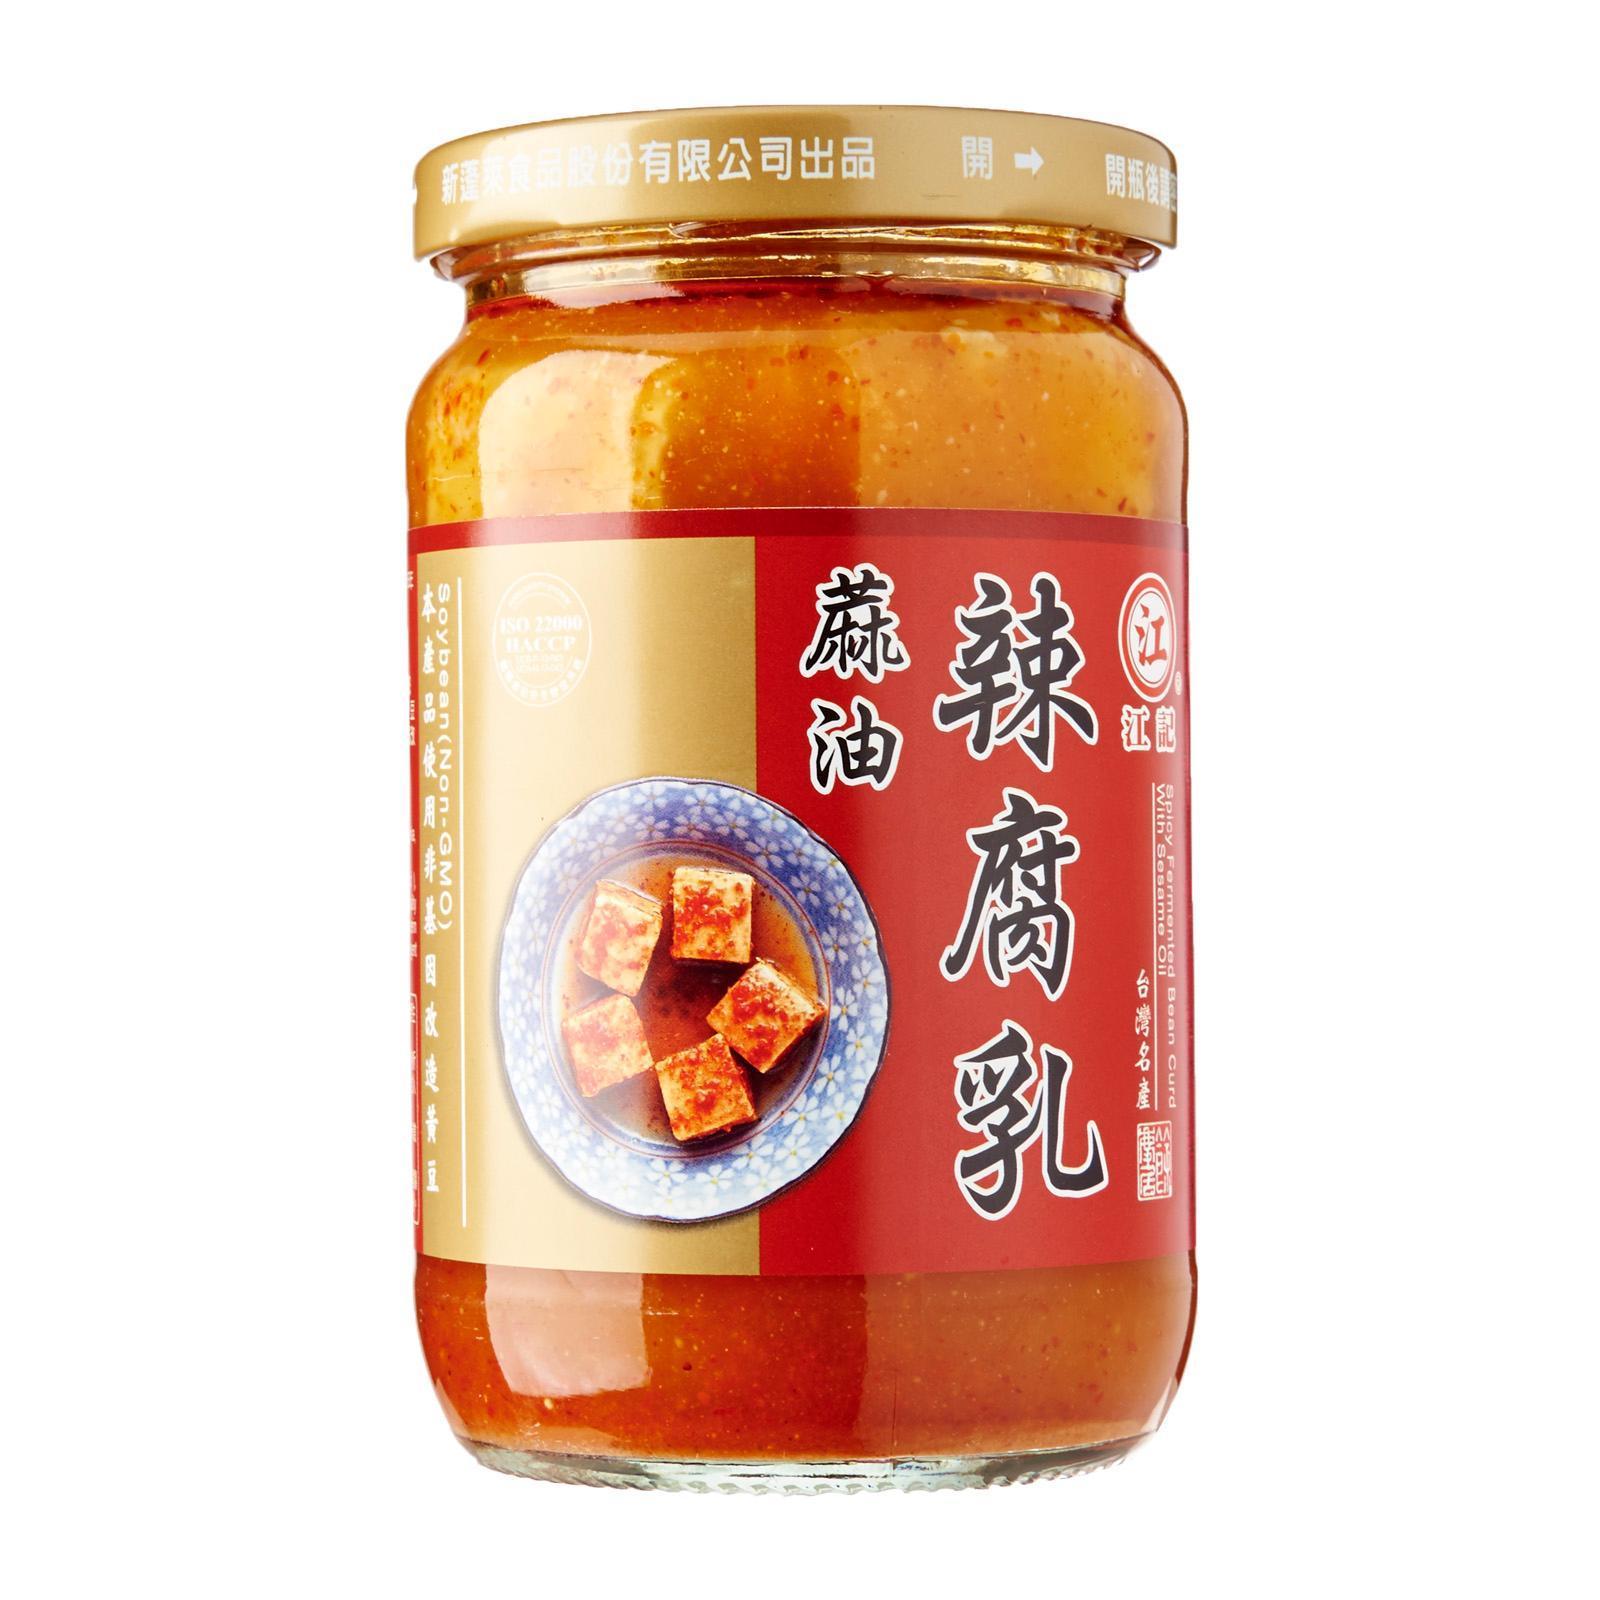 Jiang Ji Fermented Beancurd With Sesame Oil By Redmart.